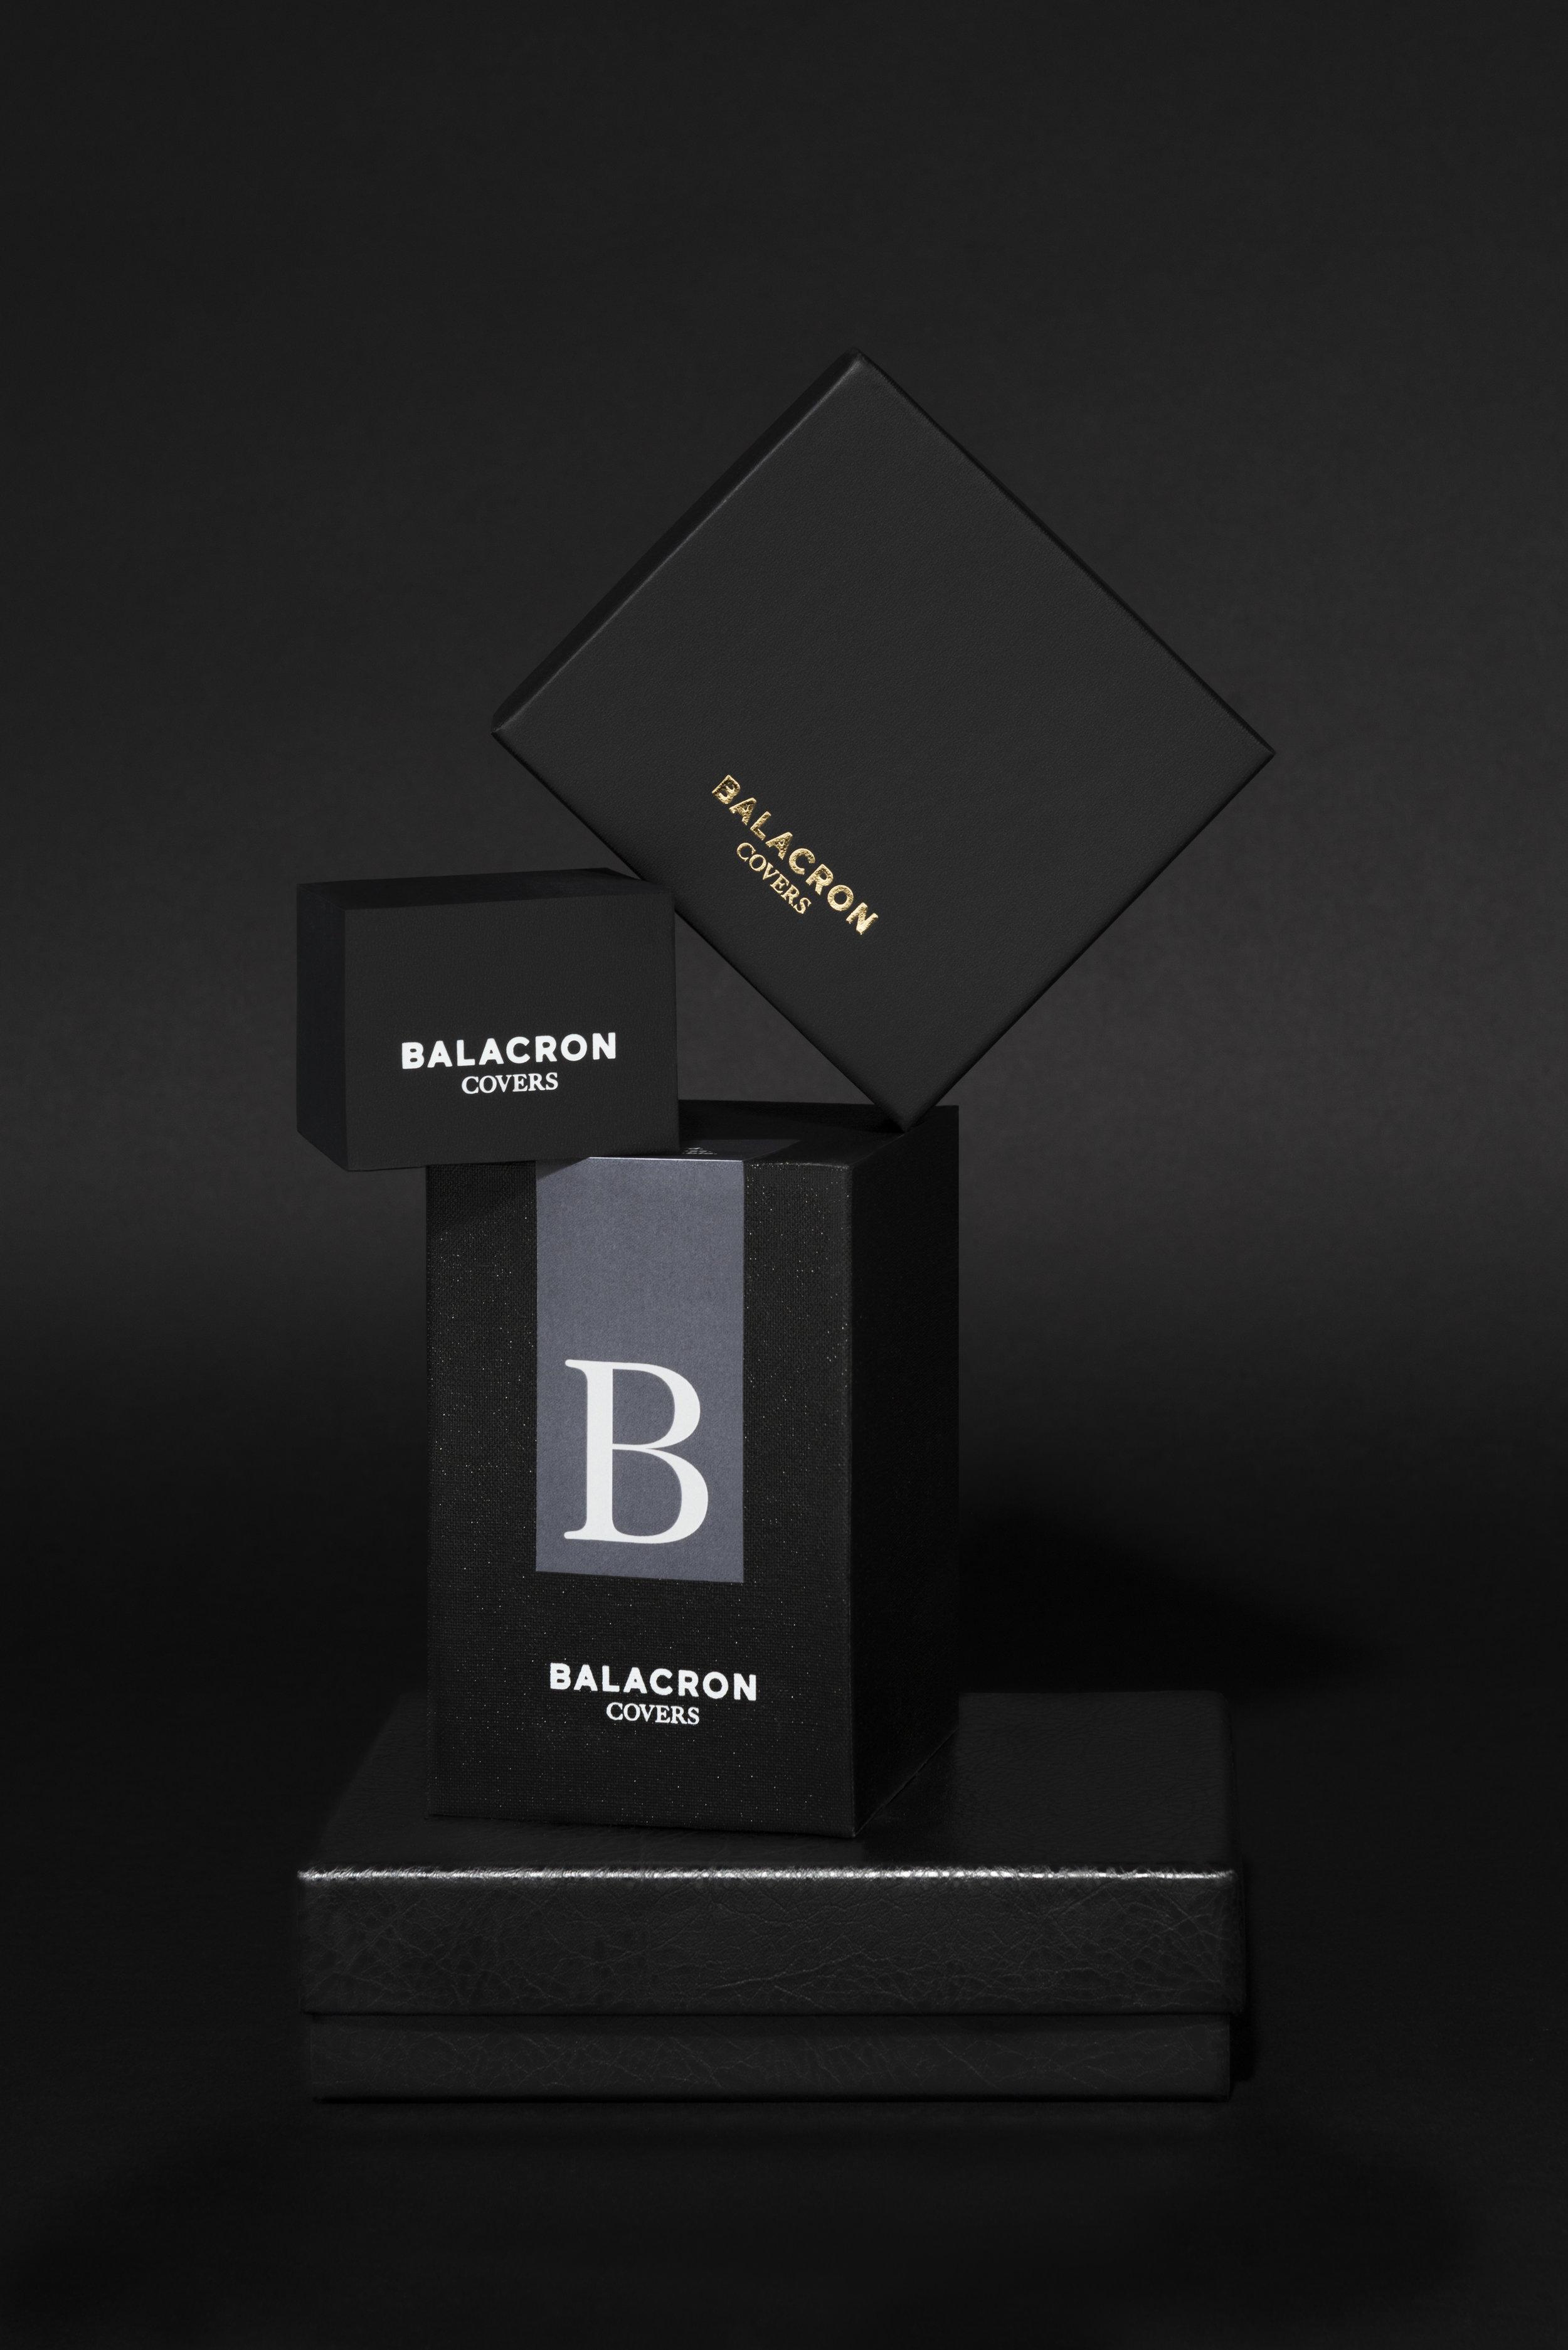 BN_boxes_black_flat_1.jpg